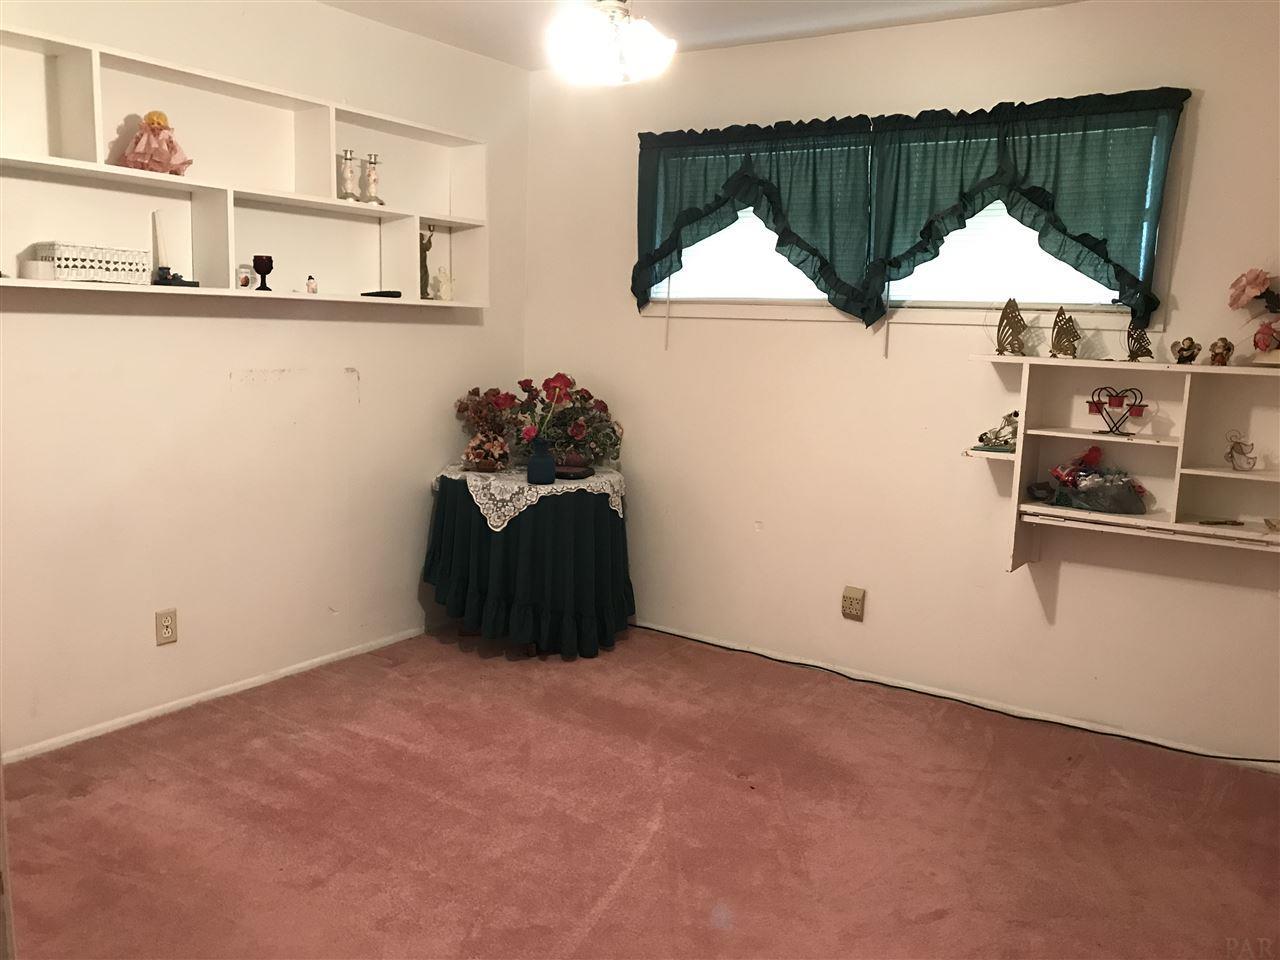 346 Drew Cir, Pensacola, FL 32503